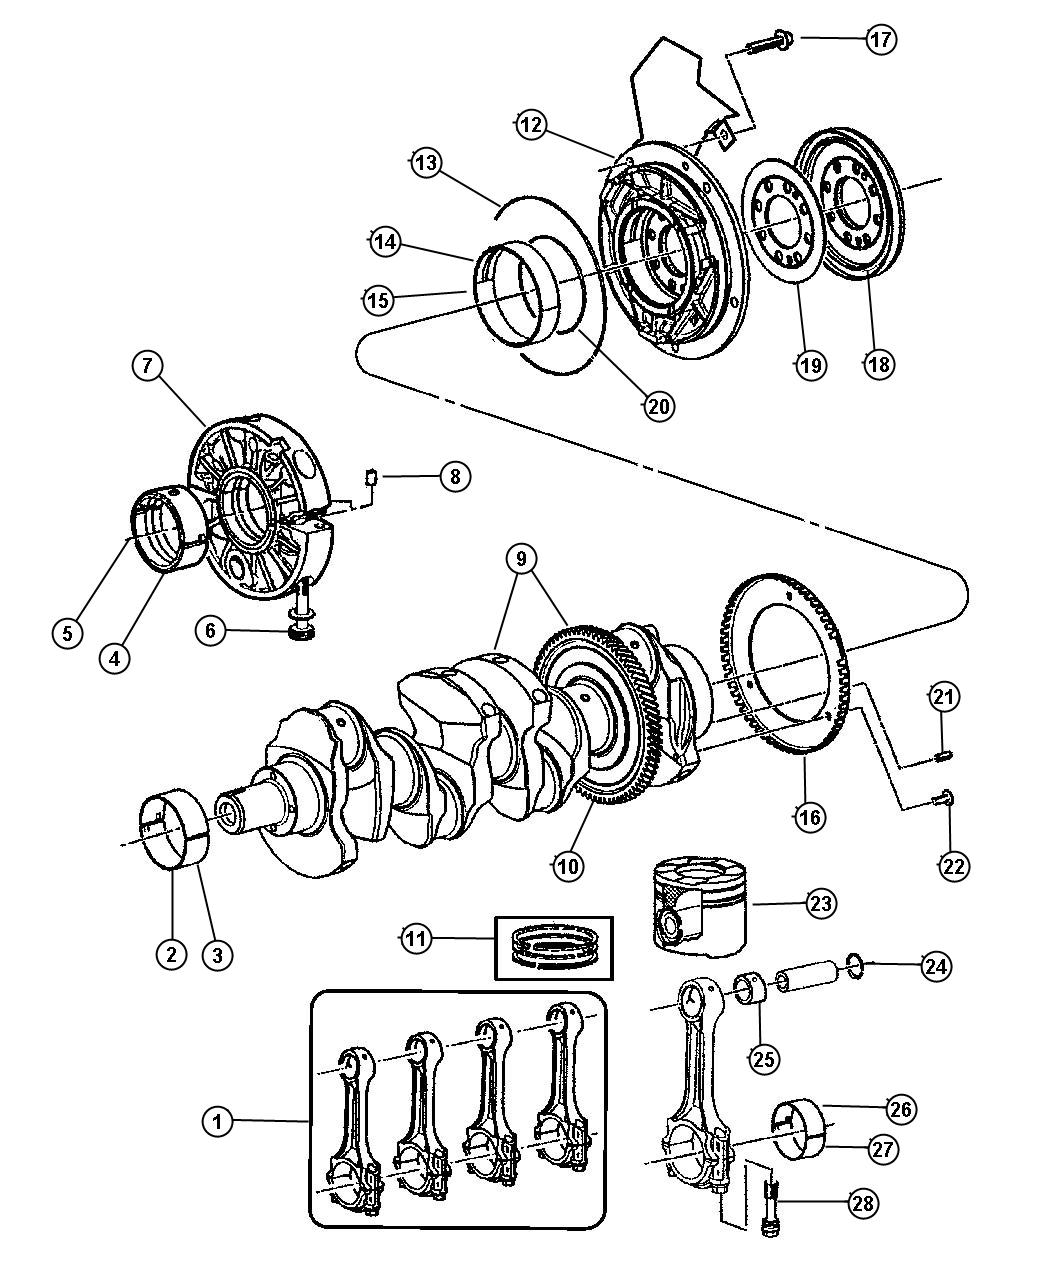 Dodge Magnum Rod Rod Kit Connecting